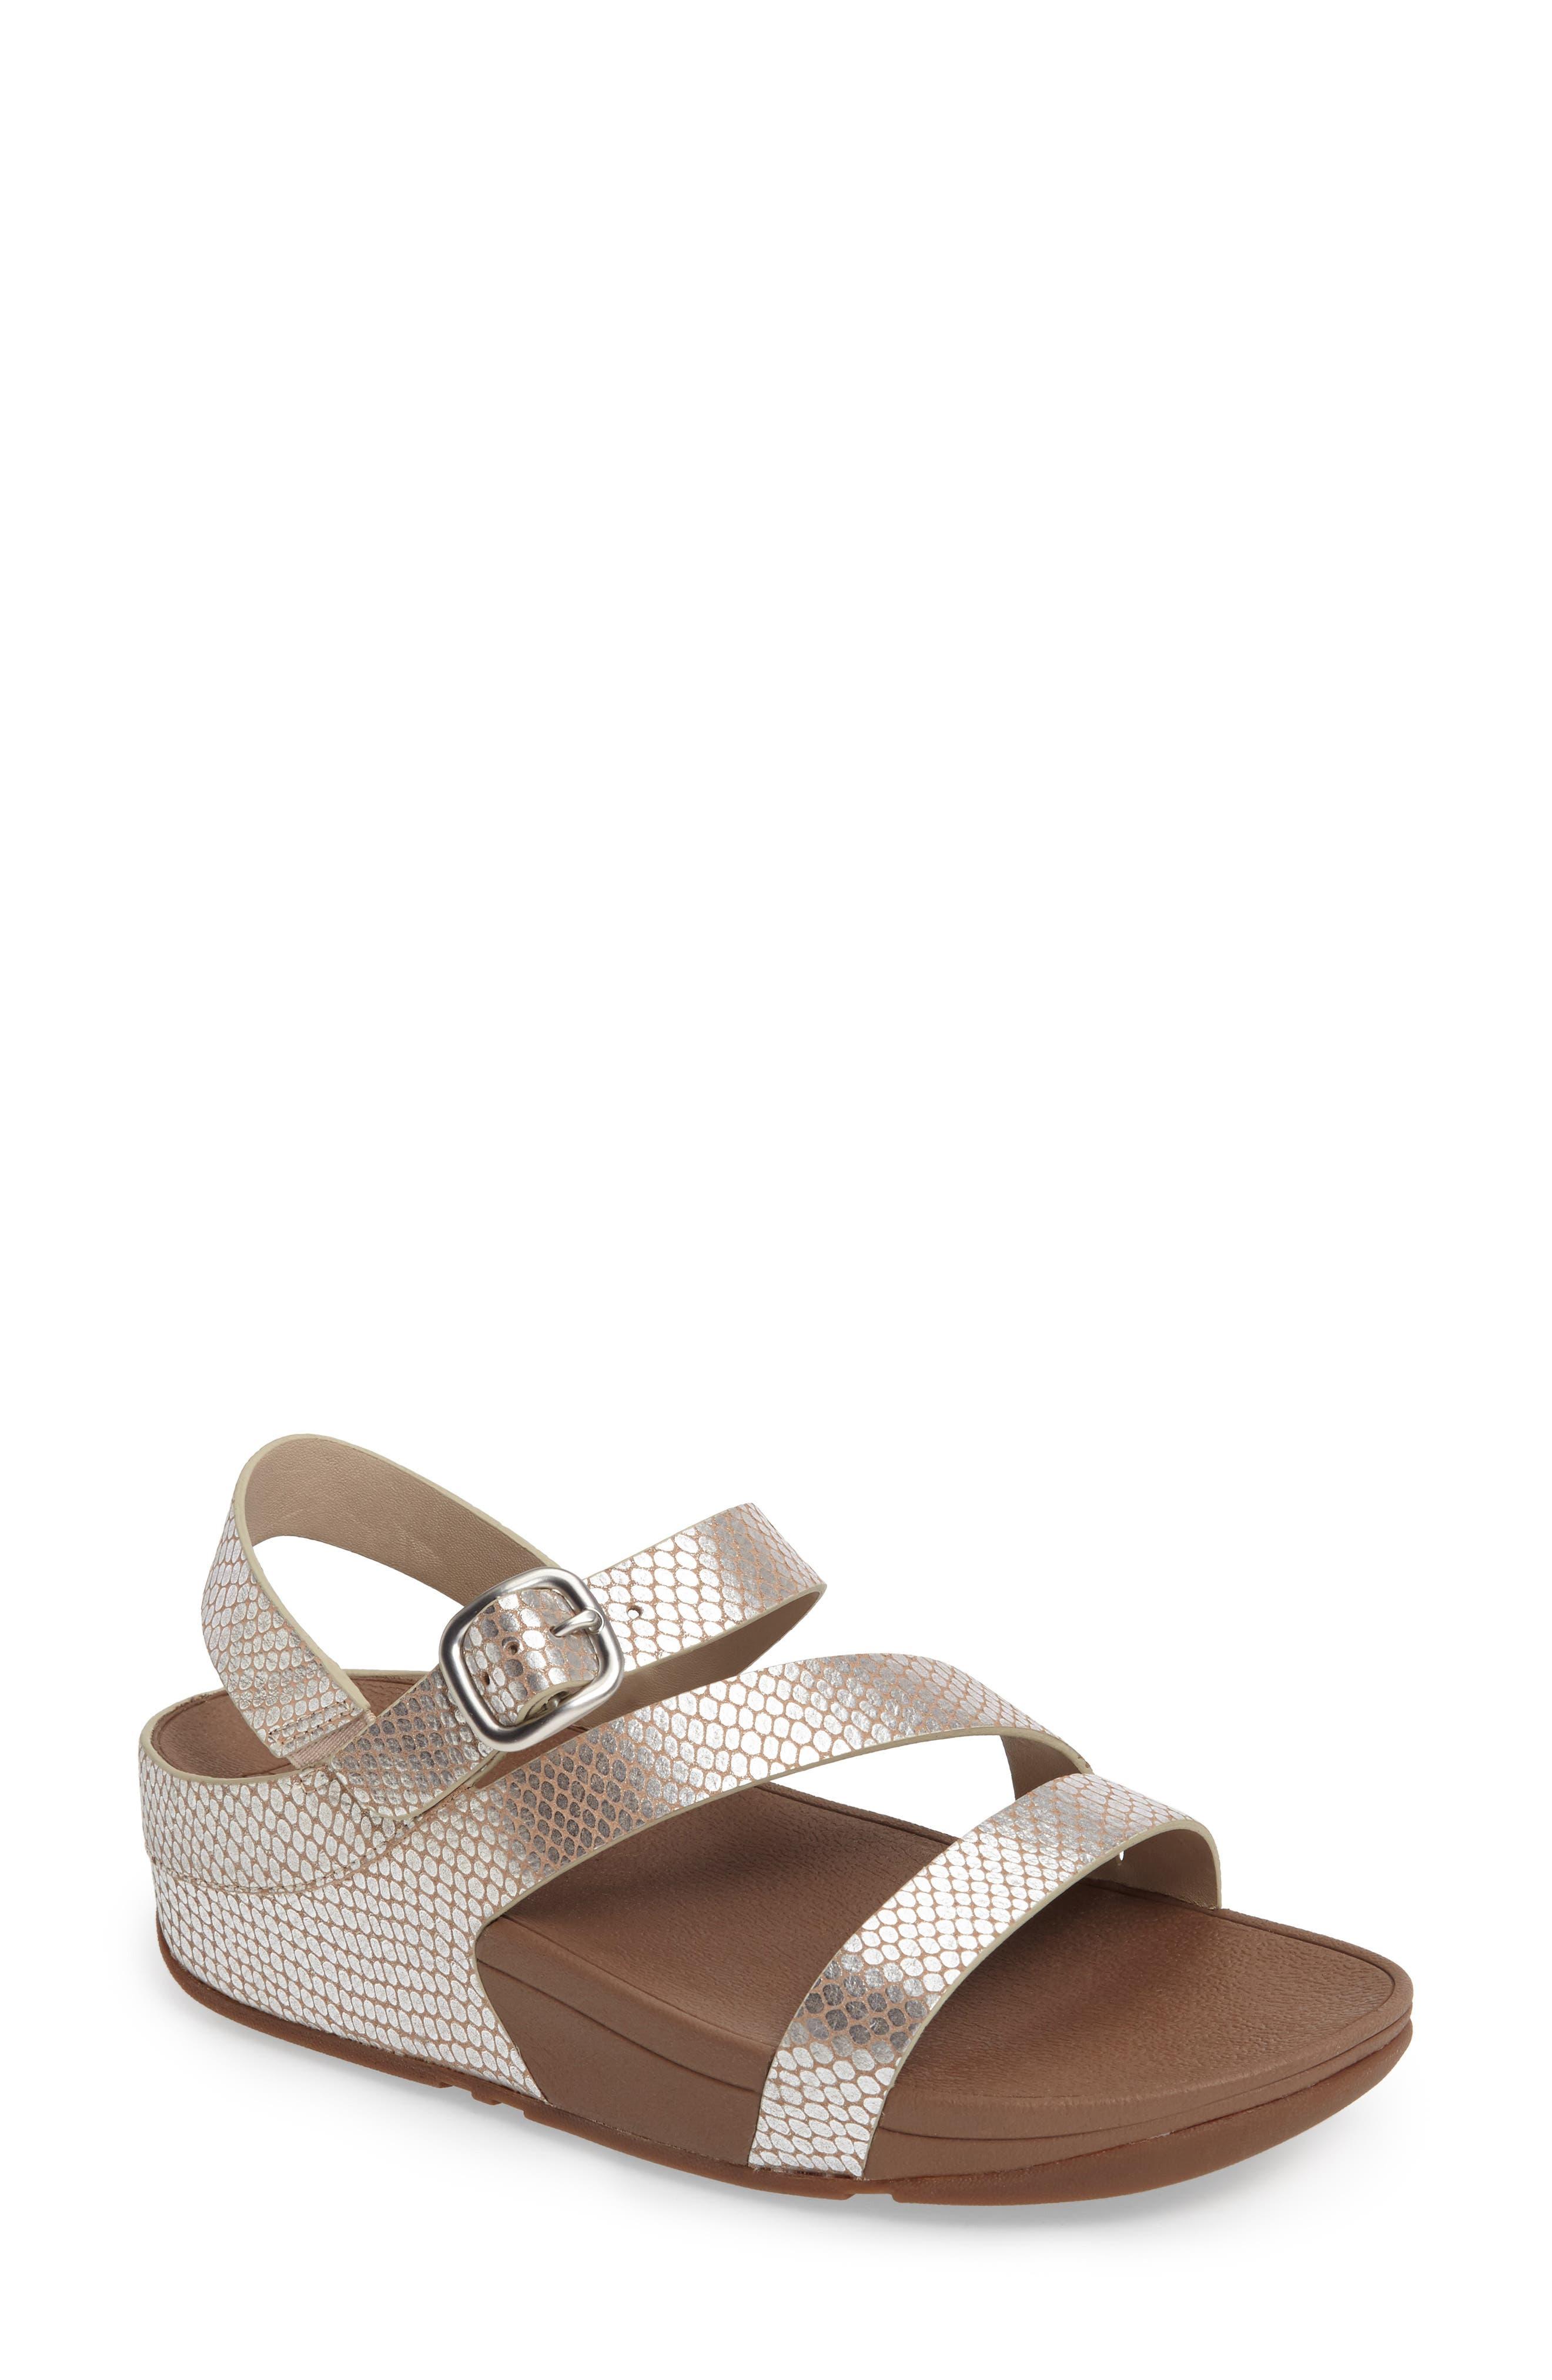 Main Image - FitFlop The Skinny™ Z-Strap Sandal (Women)